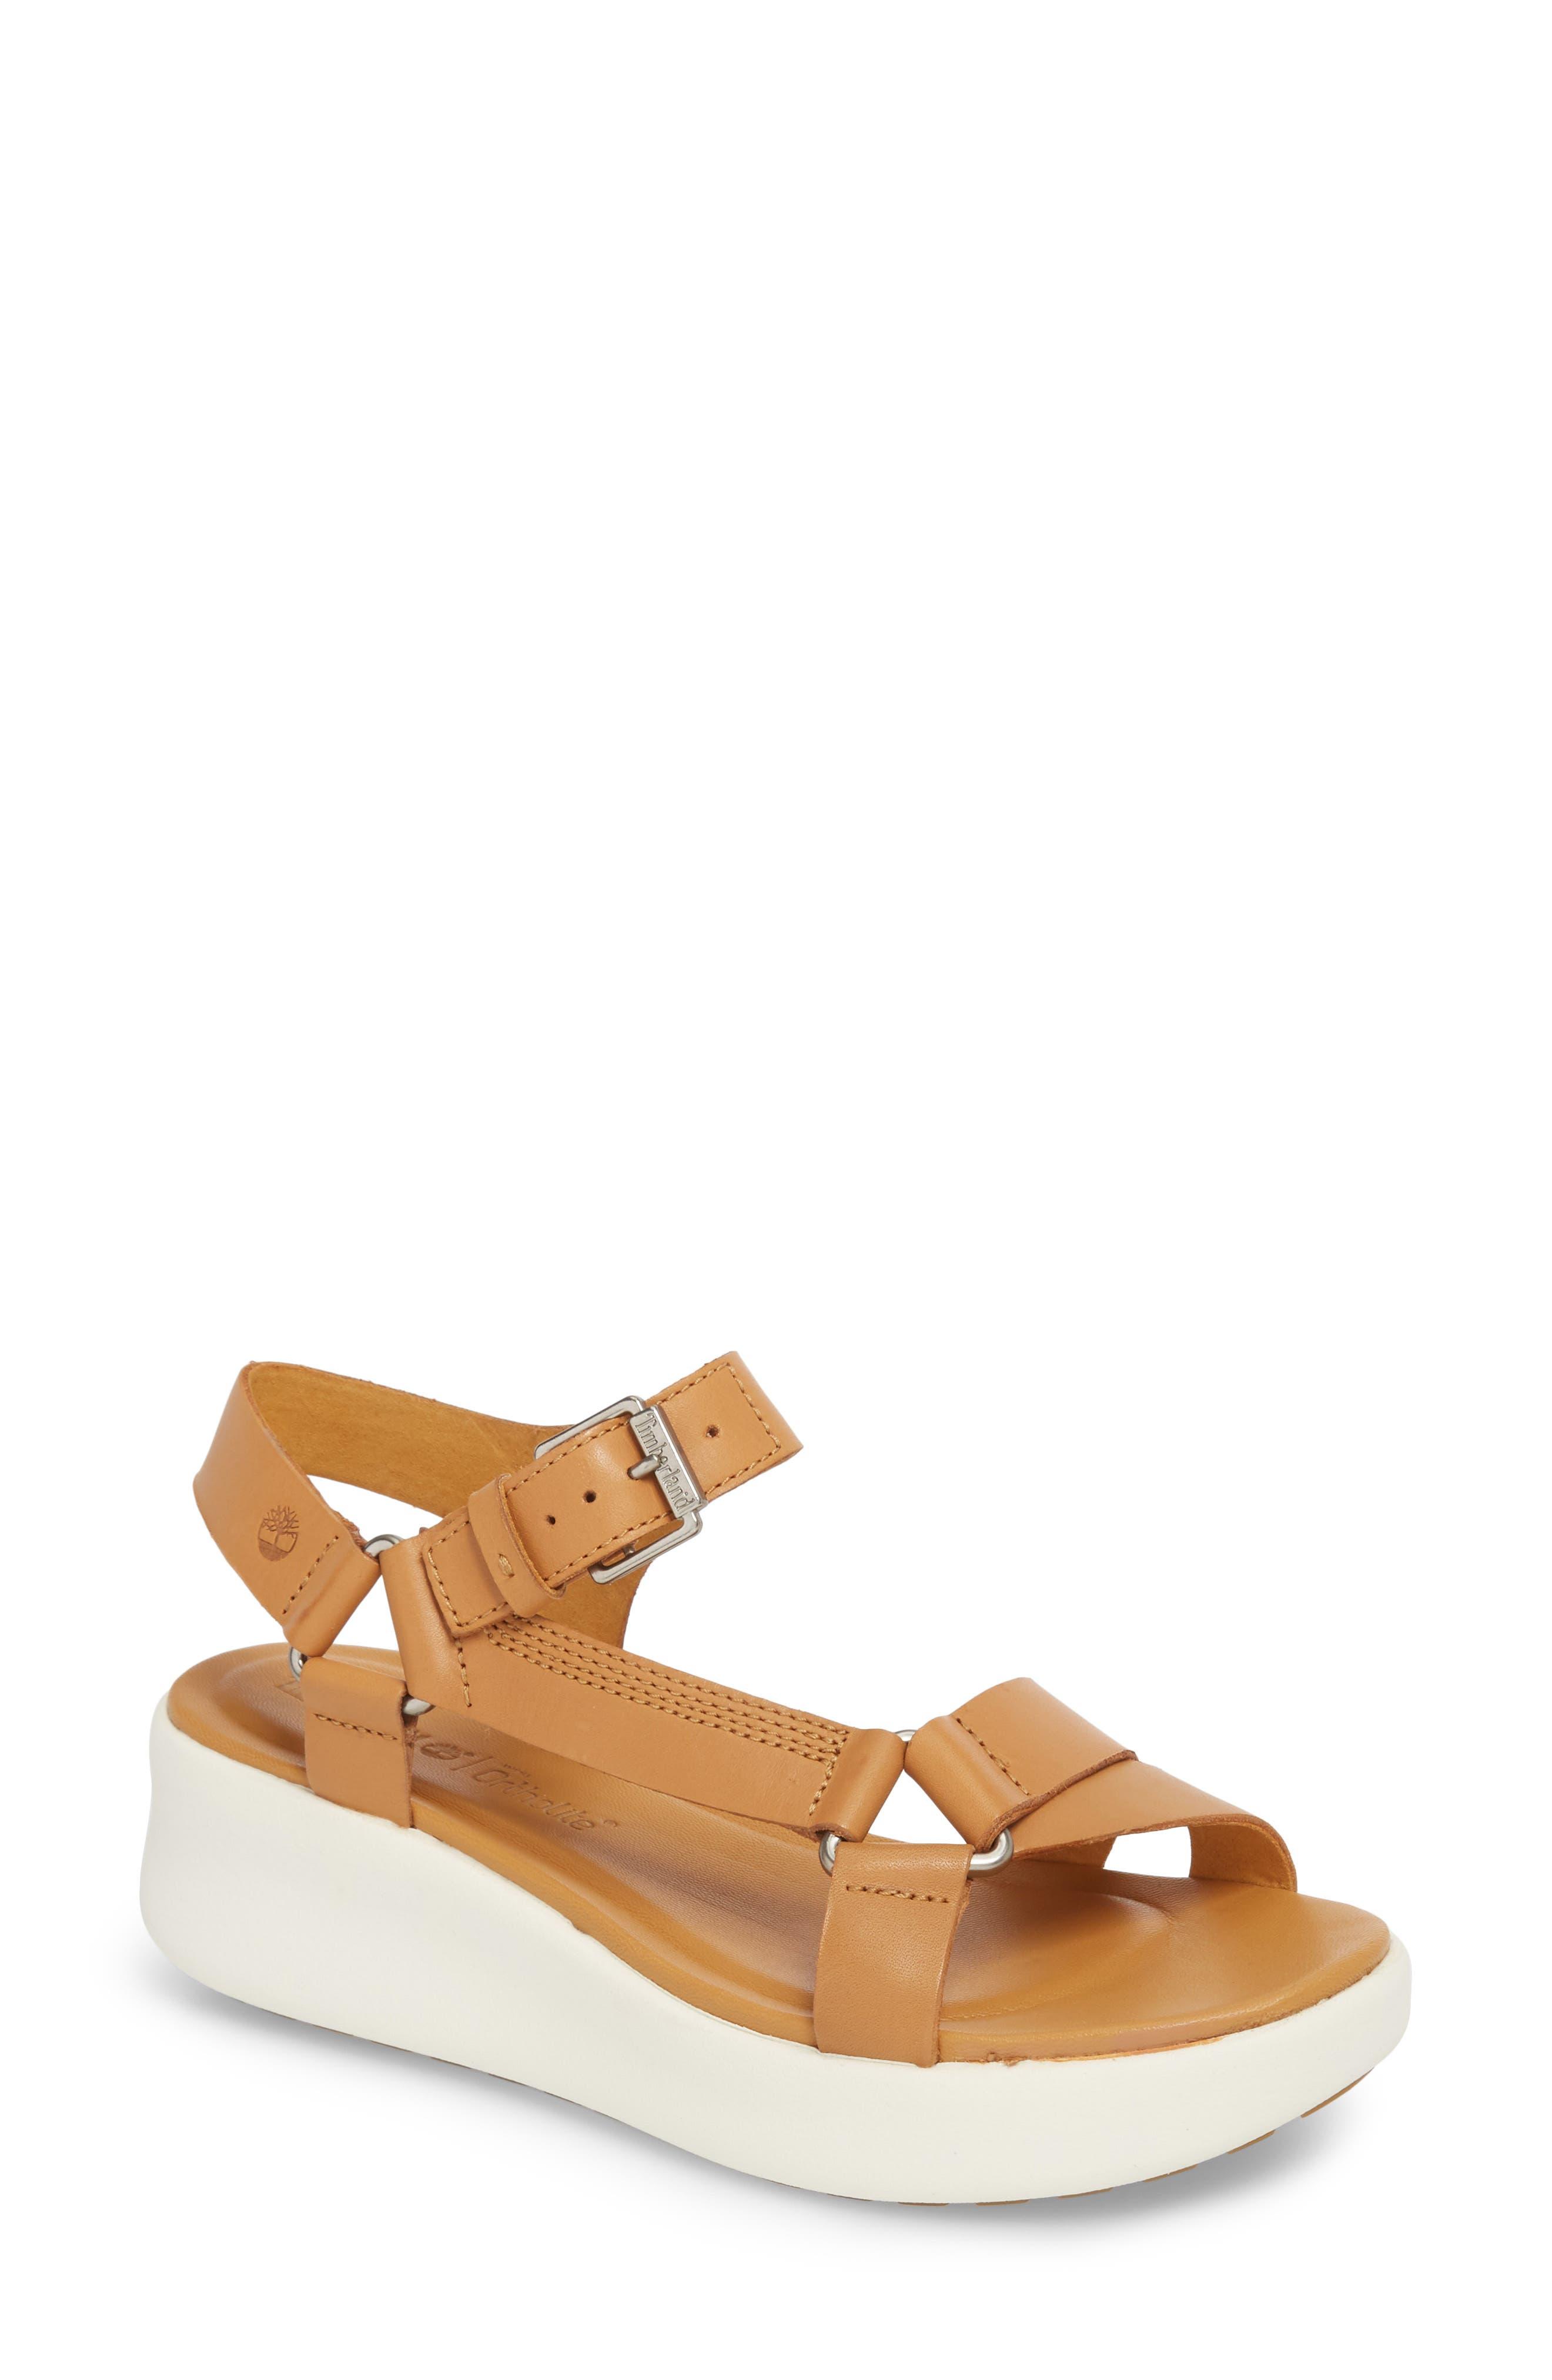 Los Angeles Wind Sport Sandal,                         Main,                         color, Medium Brown Leather